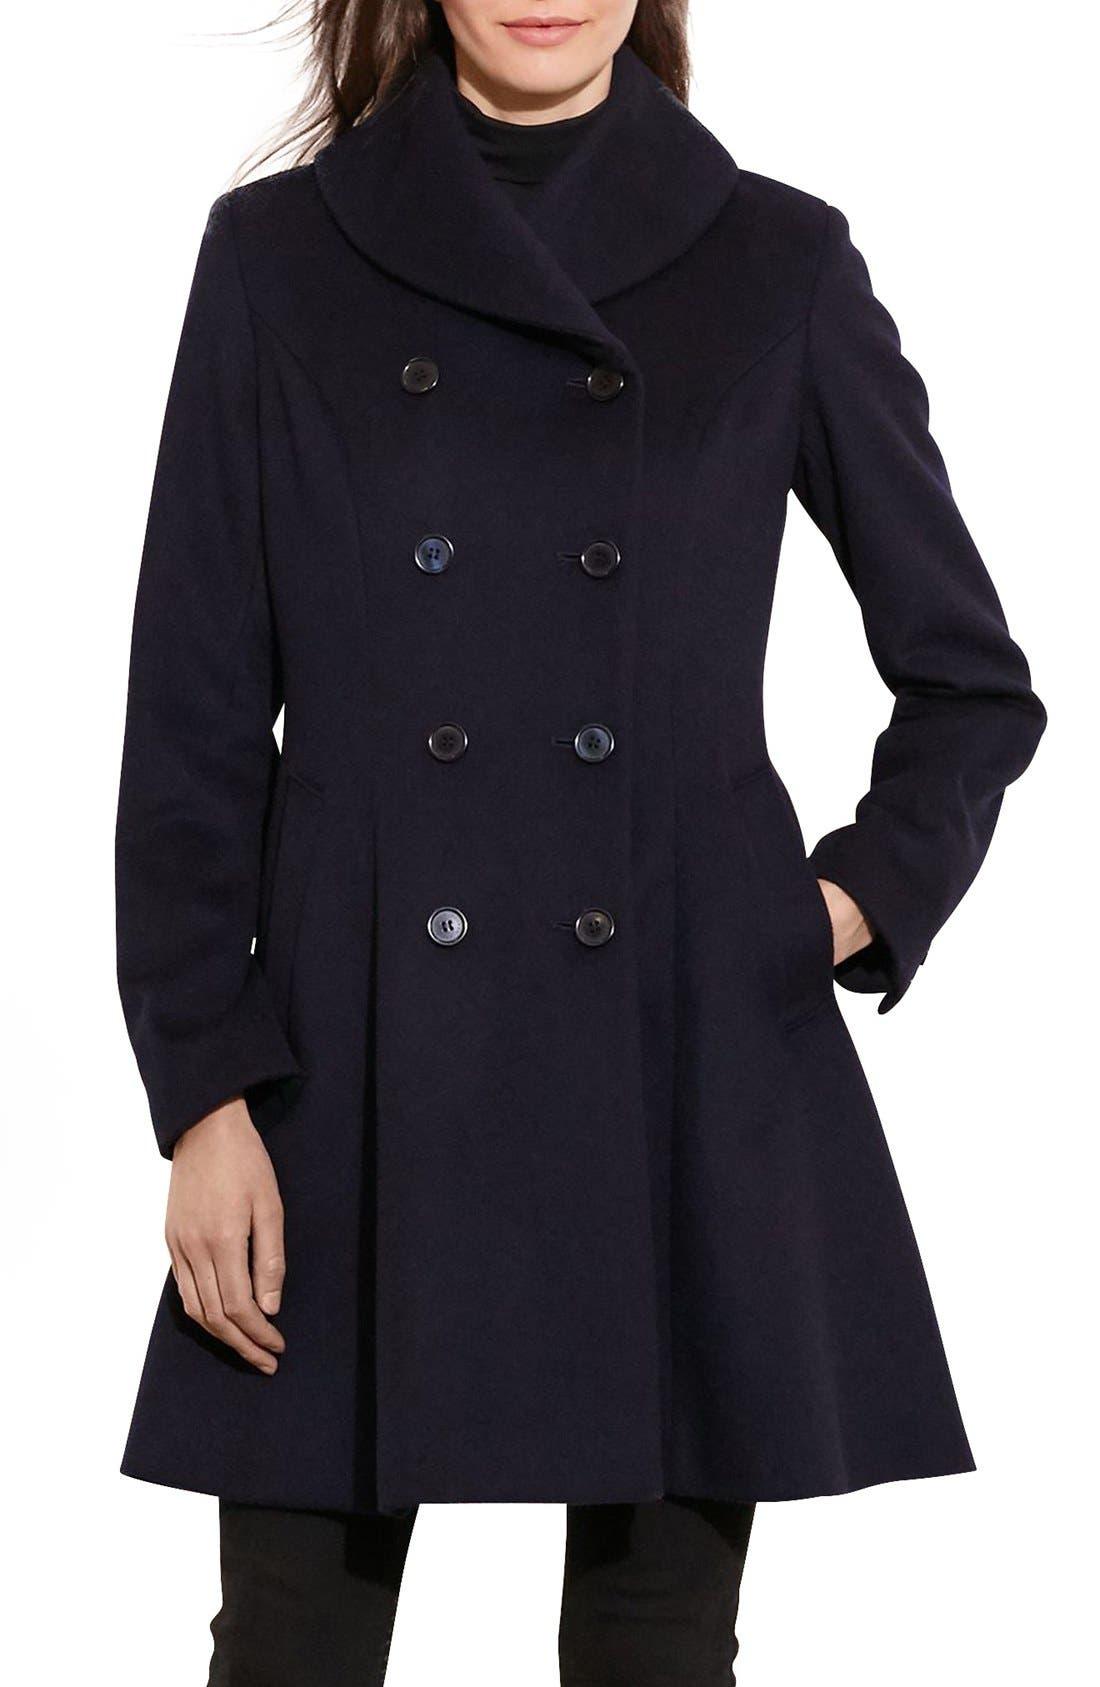 Main Image - Lauren Ralph Lauren Fit & Flare Military Coat